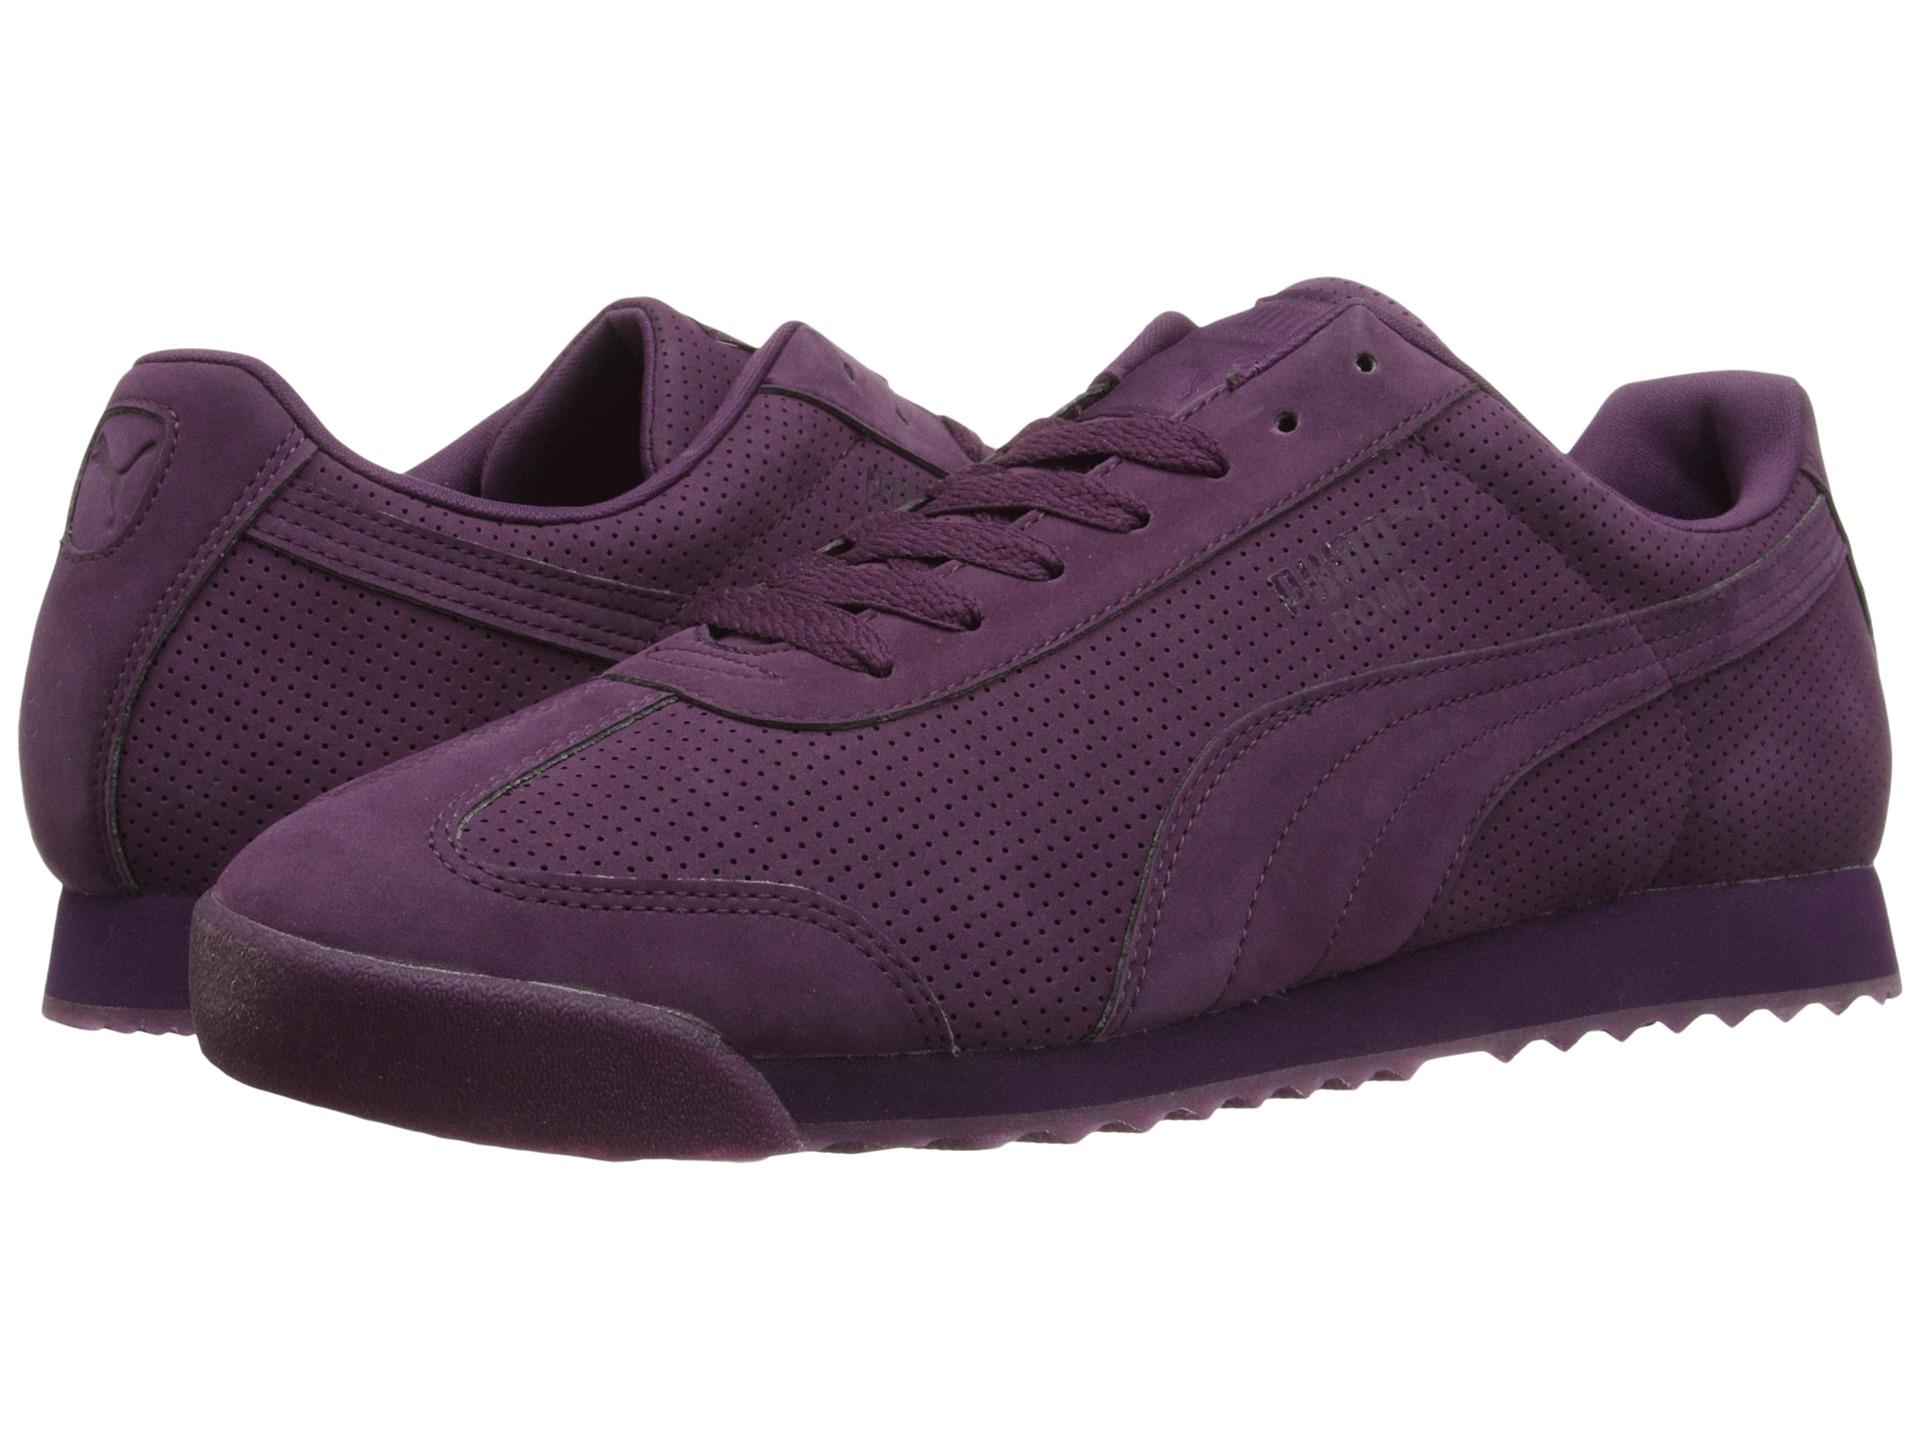 Men S Plum Puma Shoes